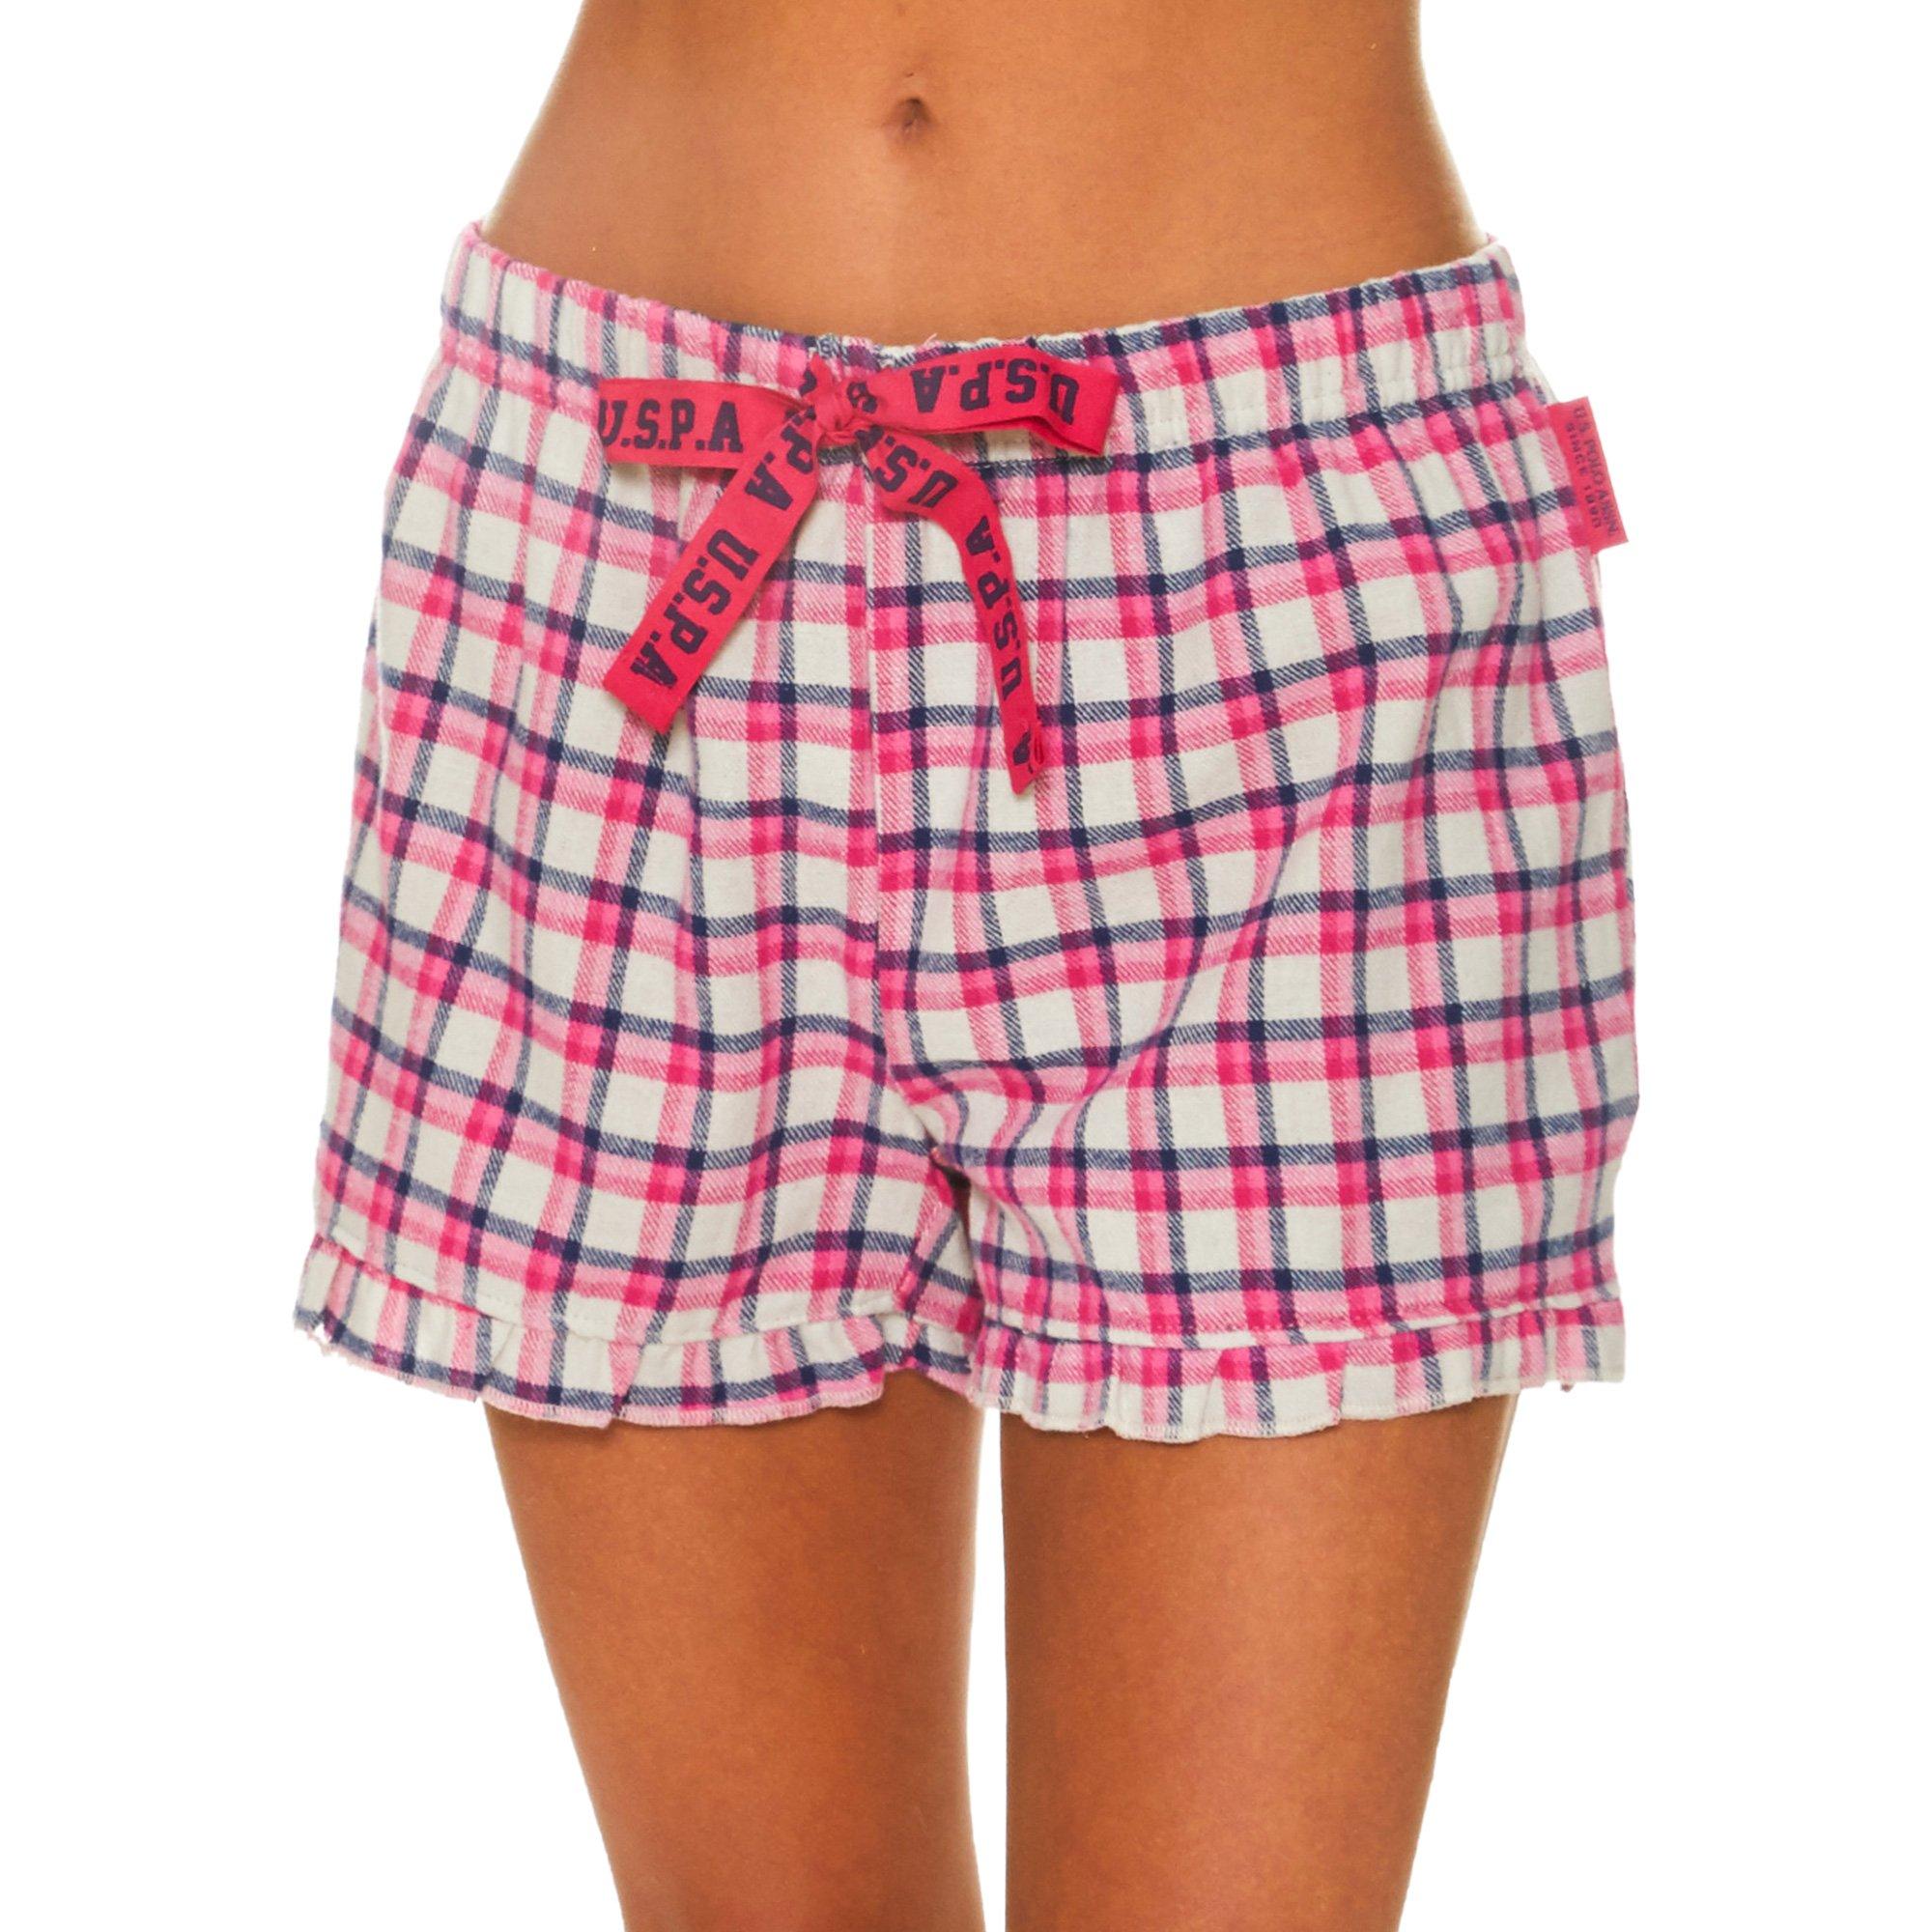 U.S. Polo Assn.. Womens Pajama Shorts with Elastic Waistband and Decorative Bow Light Grey Medium